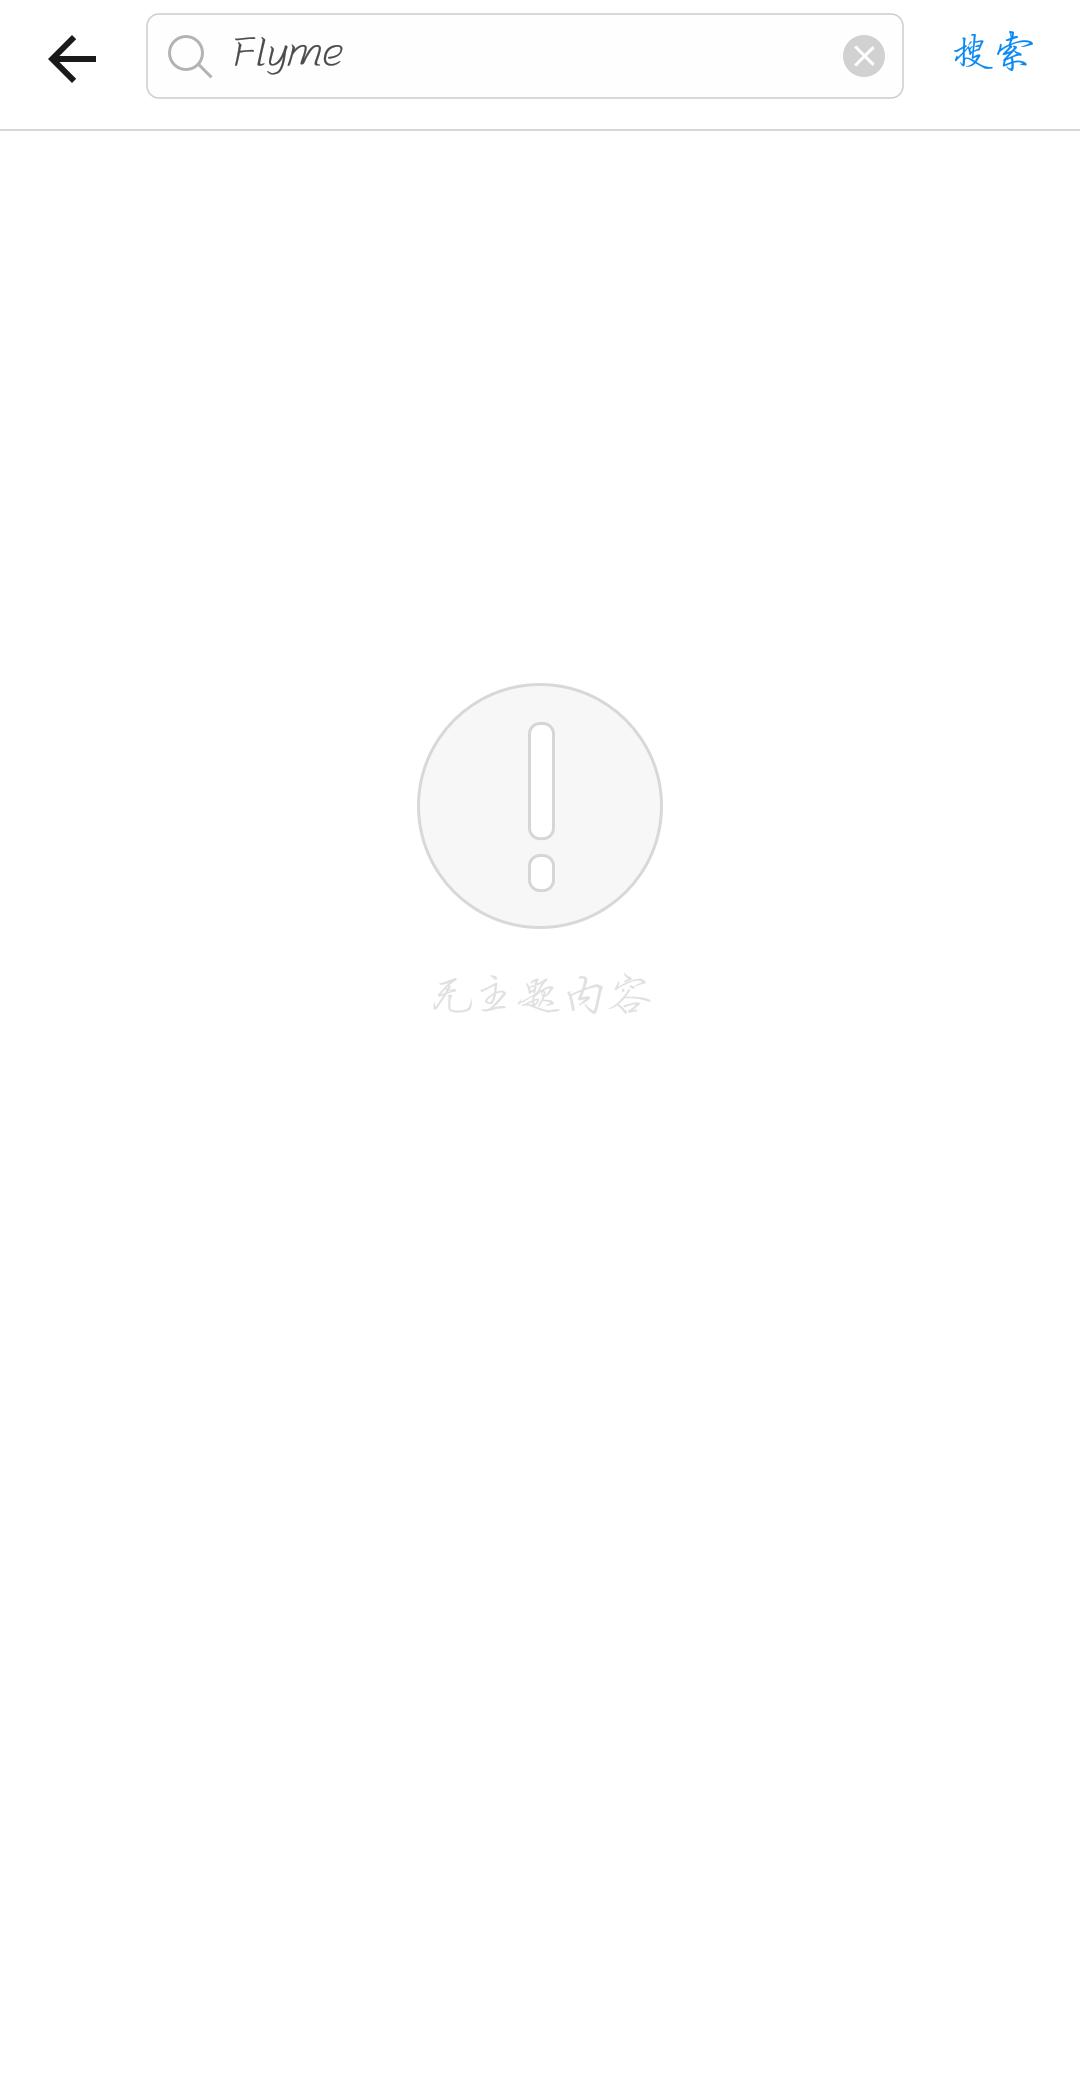 Screenshot_2018-08-16-09-46-10.png